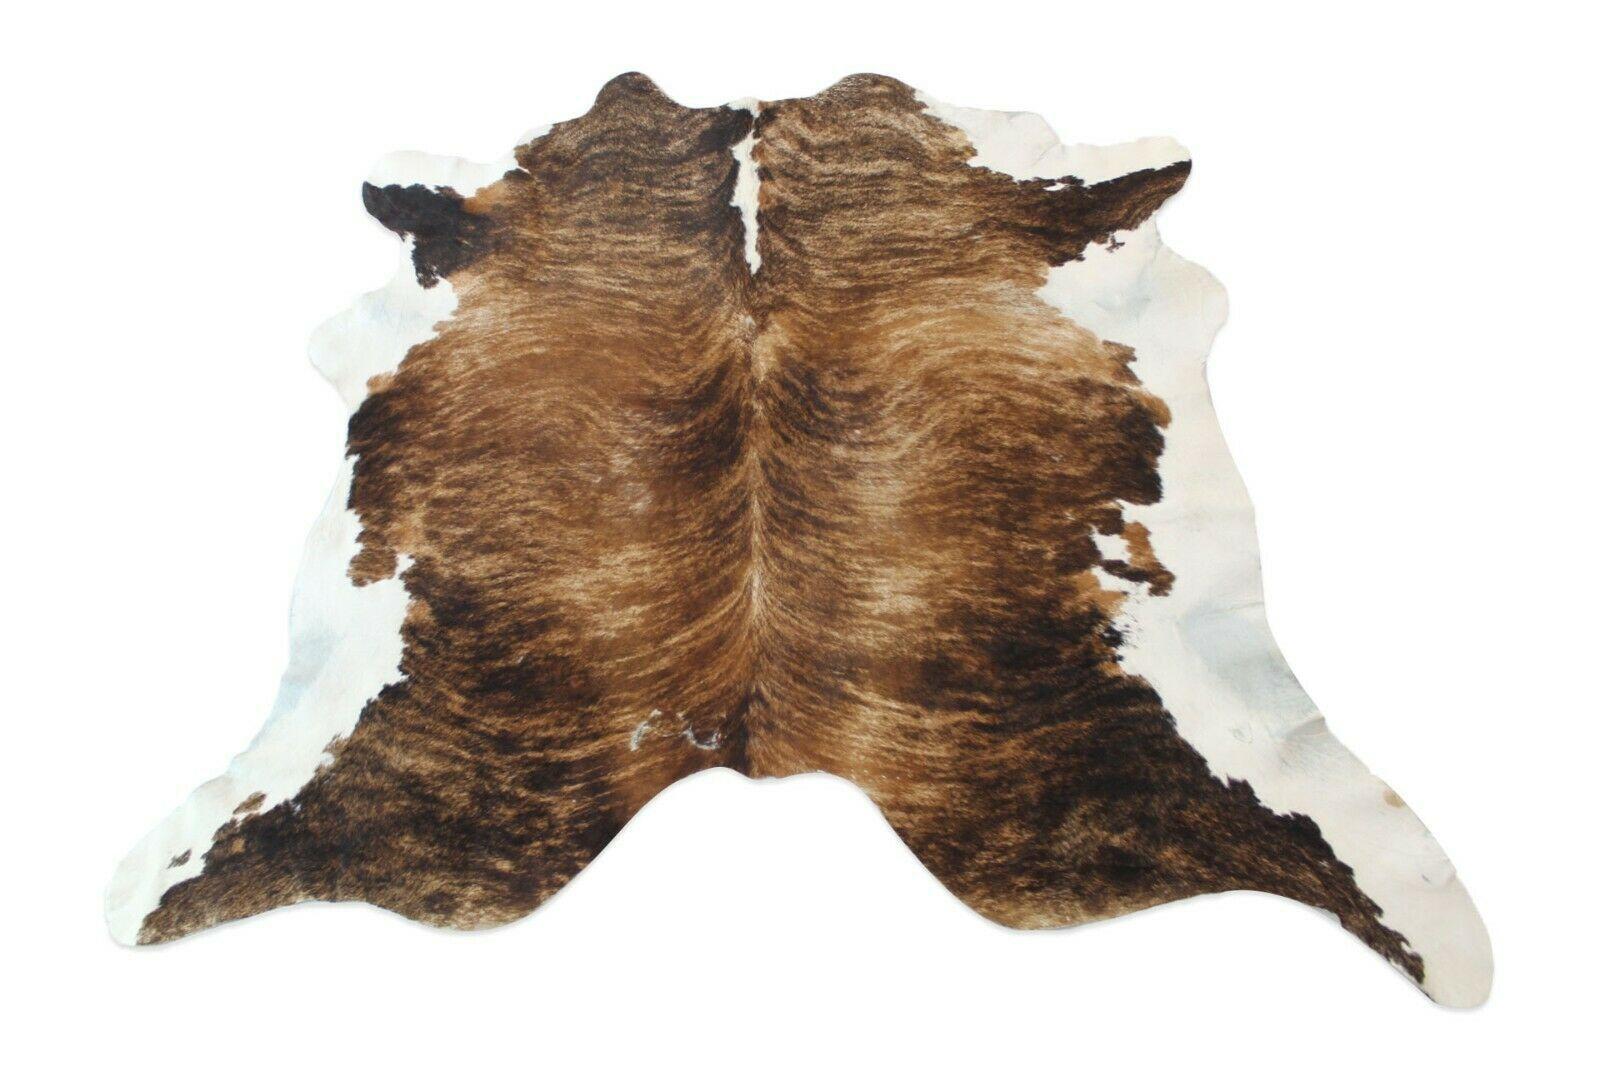 Cowhide Rug Grey Black Large Cow Skin Area Rug 6x7 Ft Pure Cow Leather Fur Decor Cow Hide Rug Brindle Cowhide Leather Rug